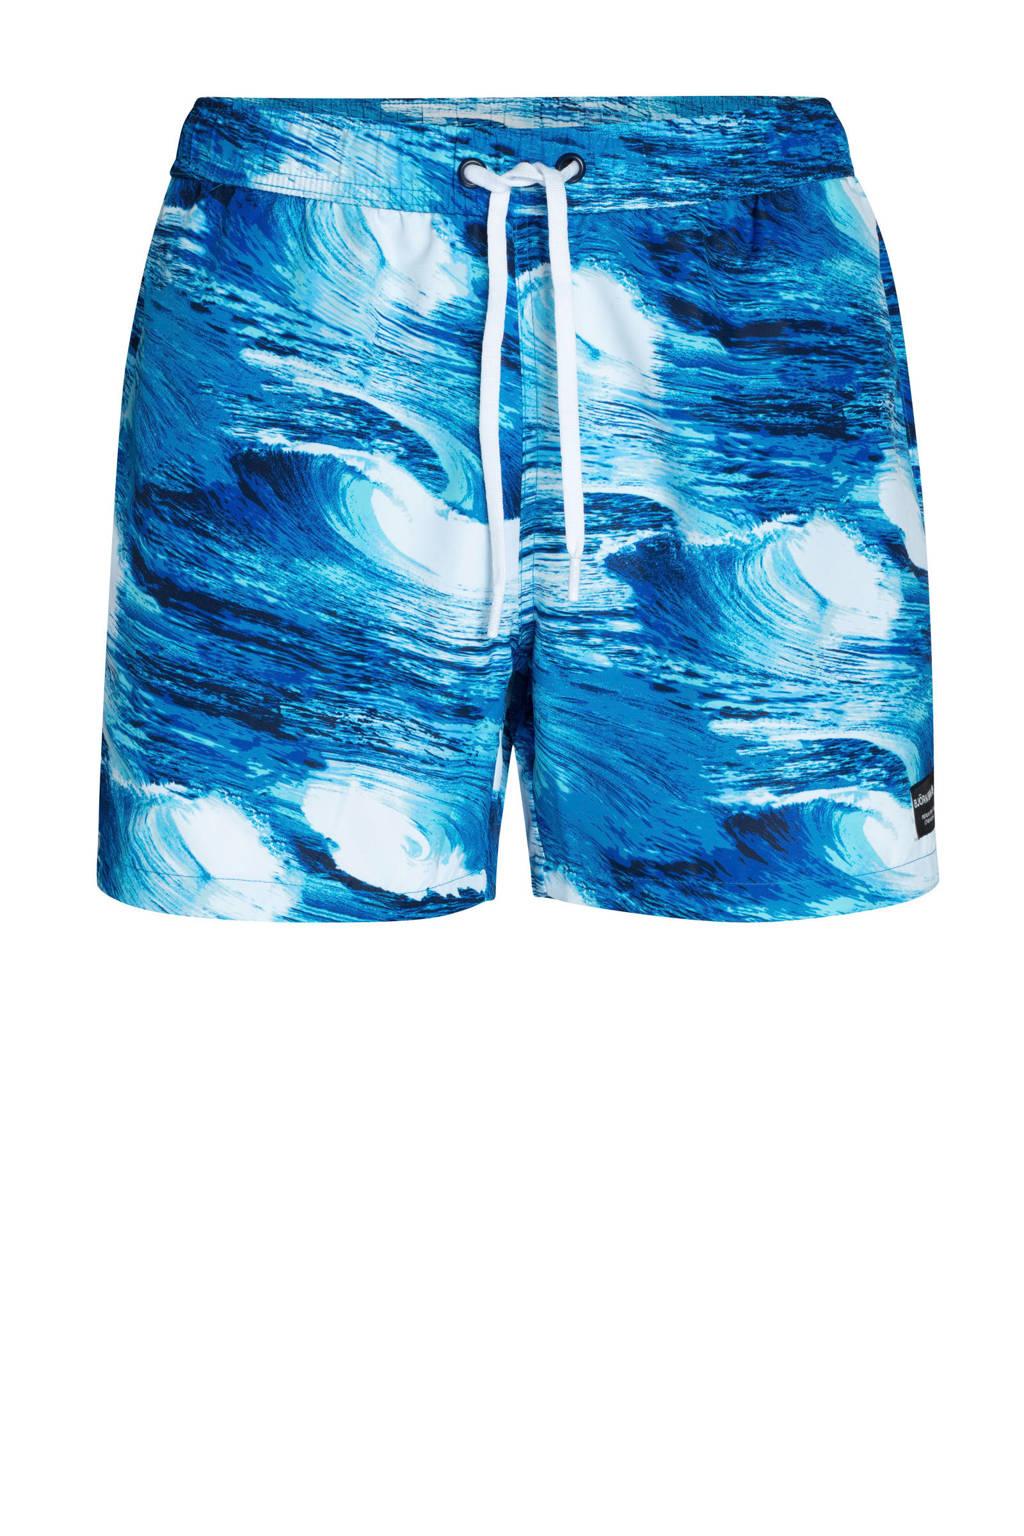 Björn Borg zwemshort met all over print blauw, Blauw